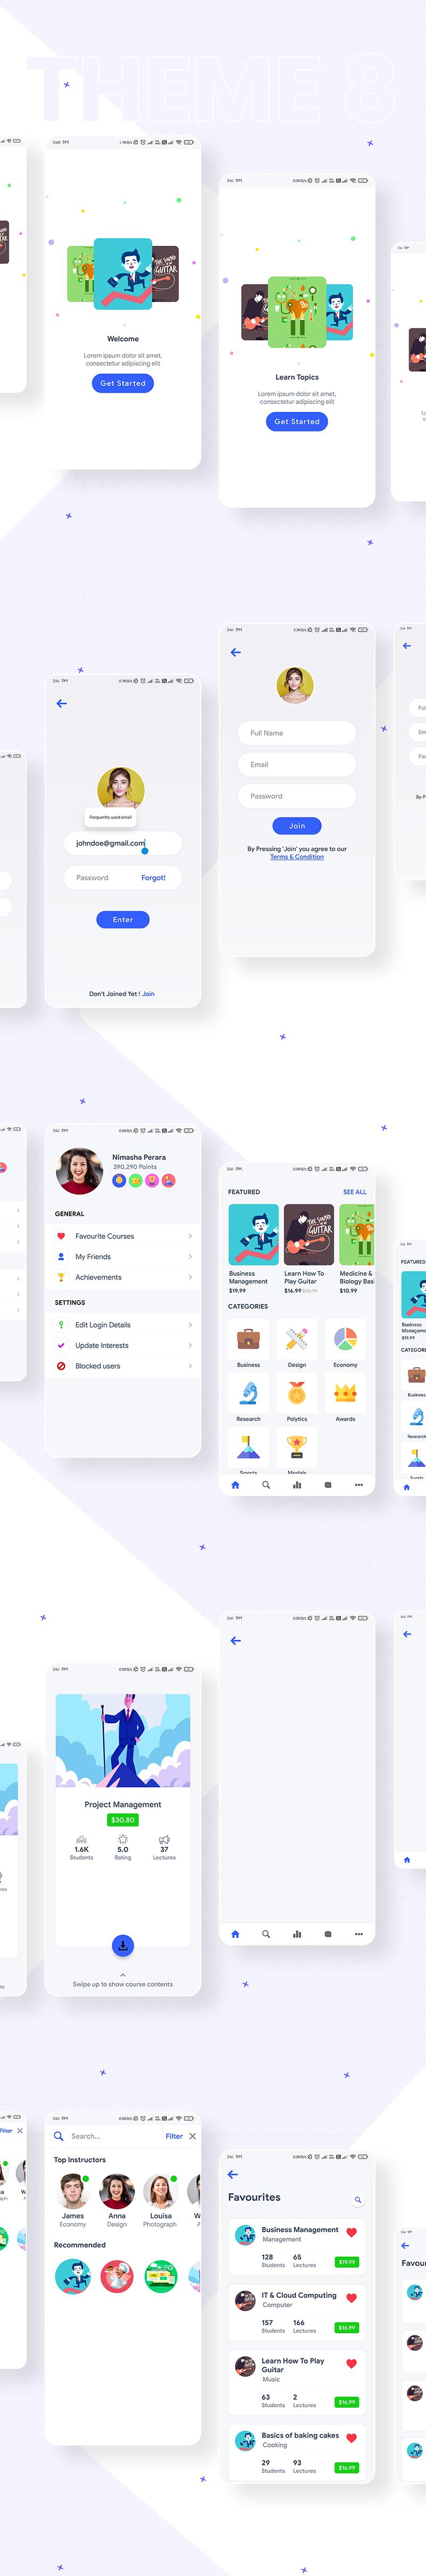 Prokit - Biggest Android UI Kit - 24 biggest android ui kit Prokit theme 7